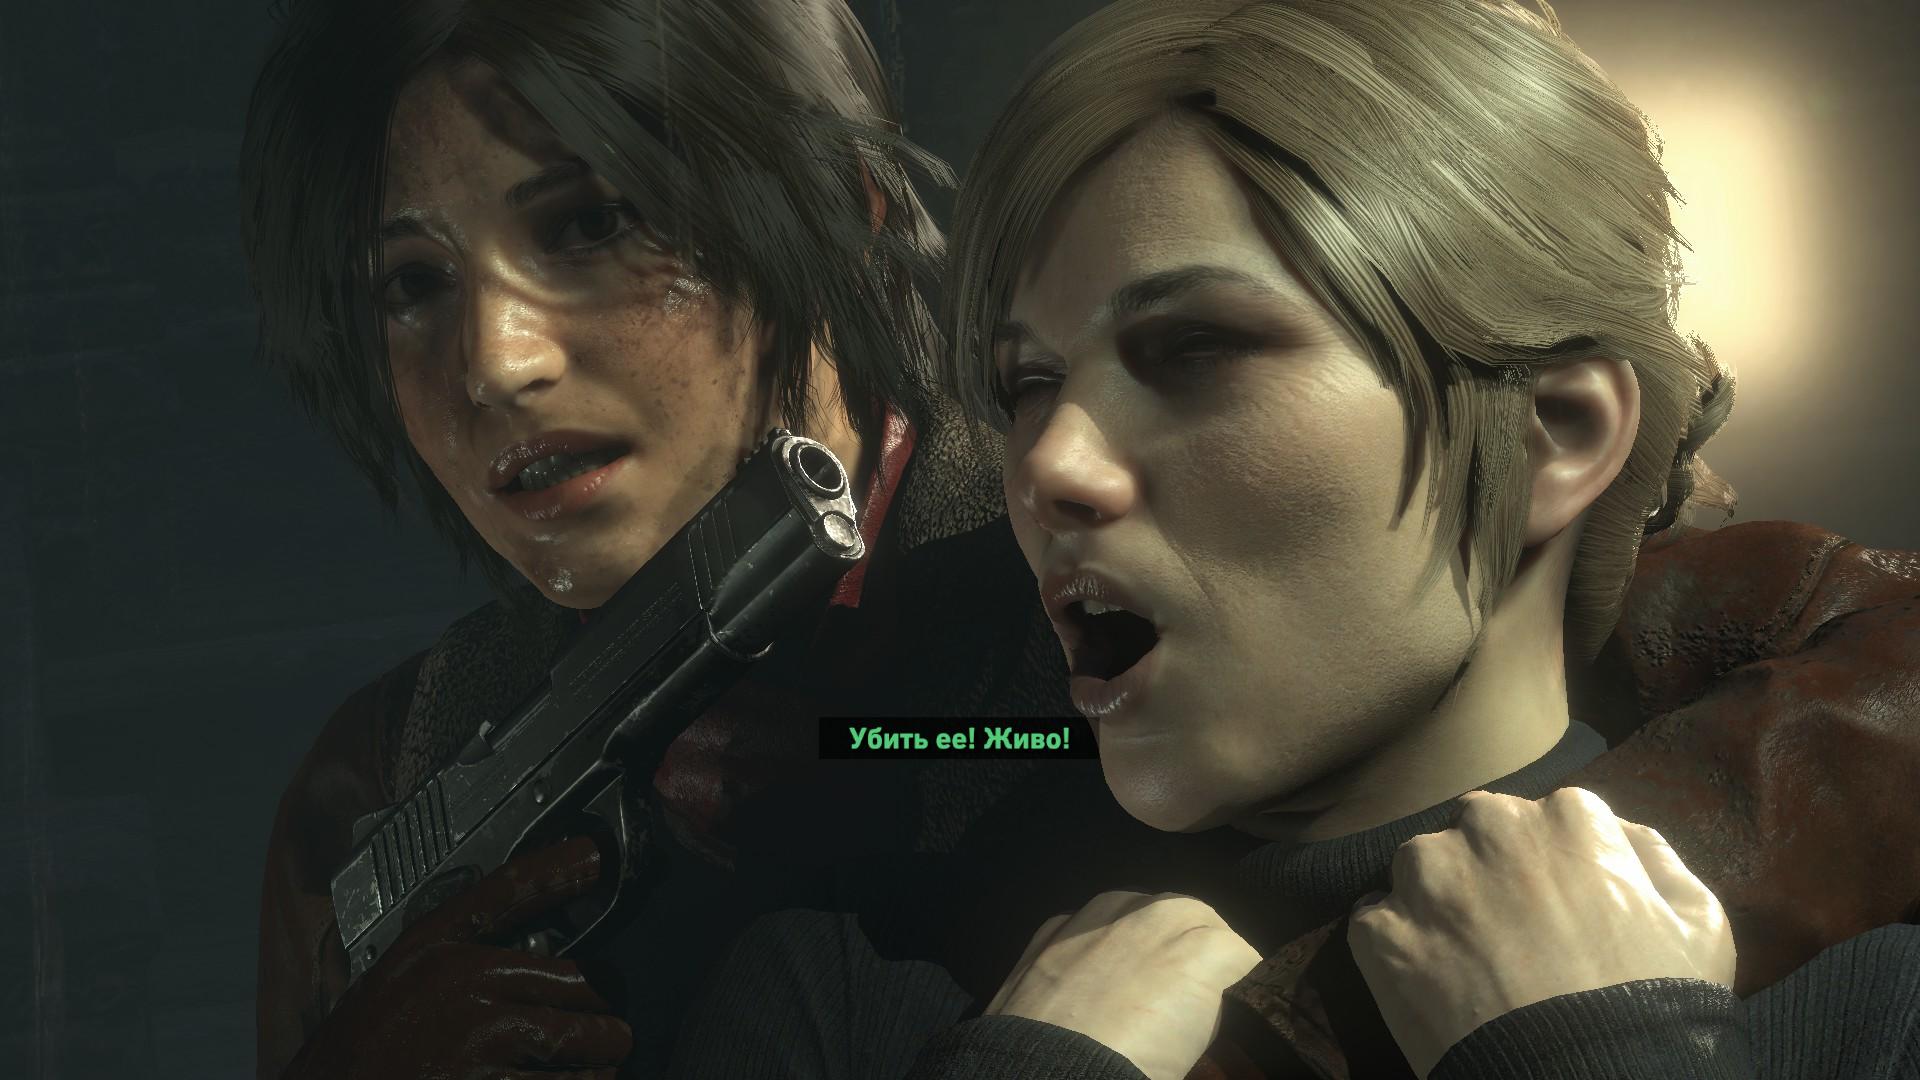 20171217022035_1.jpg - Rise of the Tomb Raider